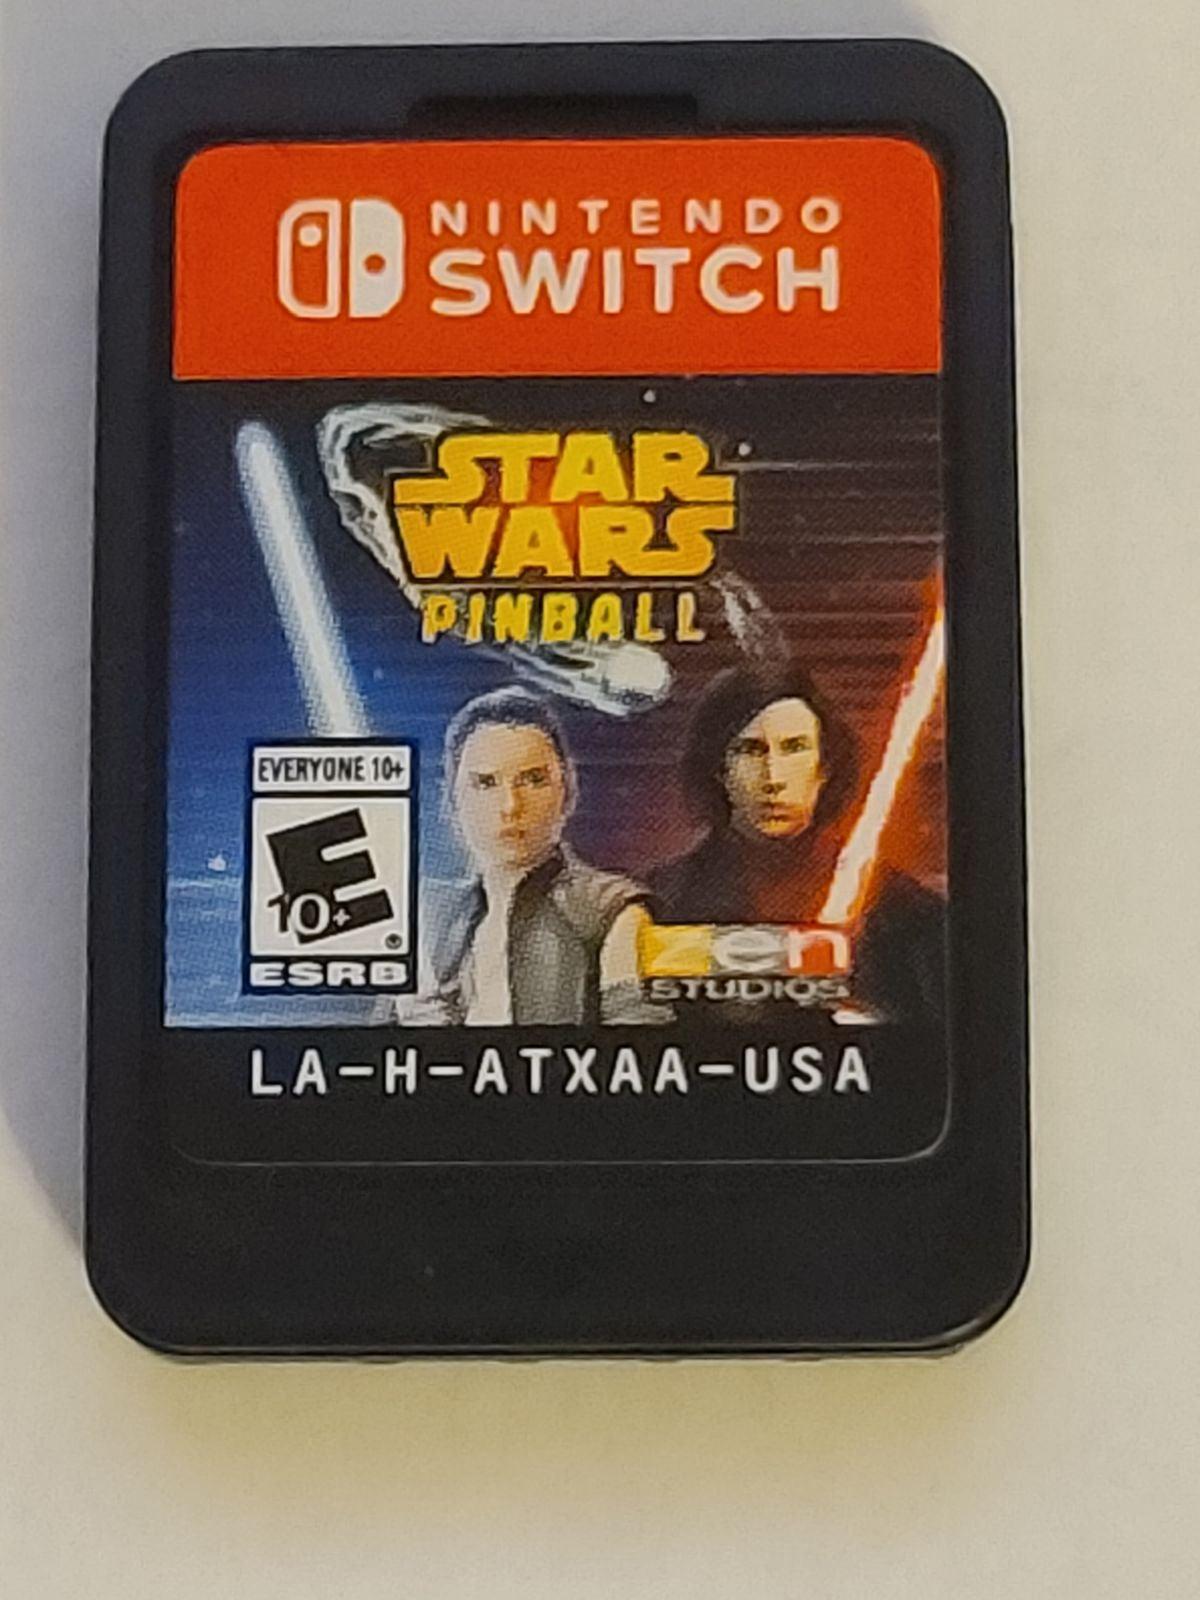 Stars wars pinball